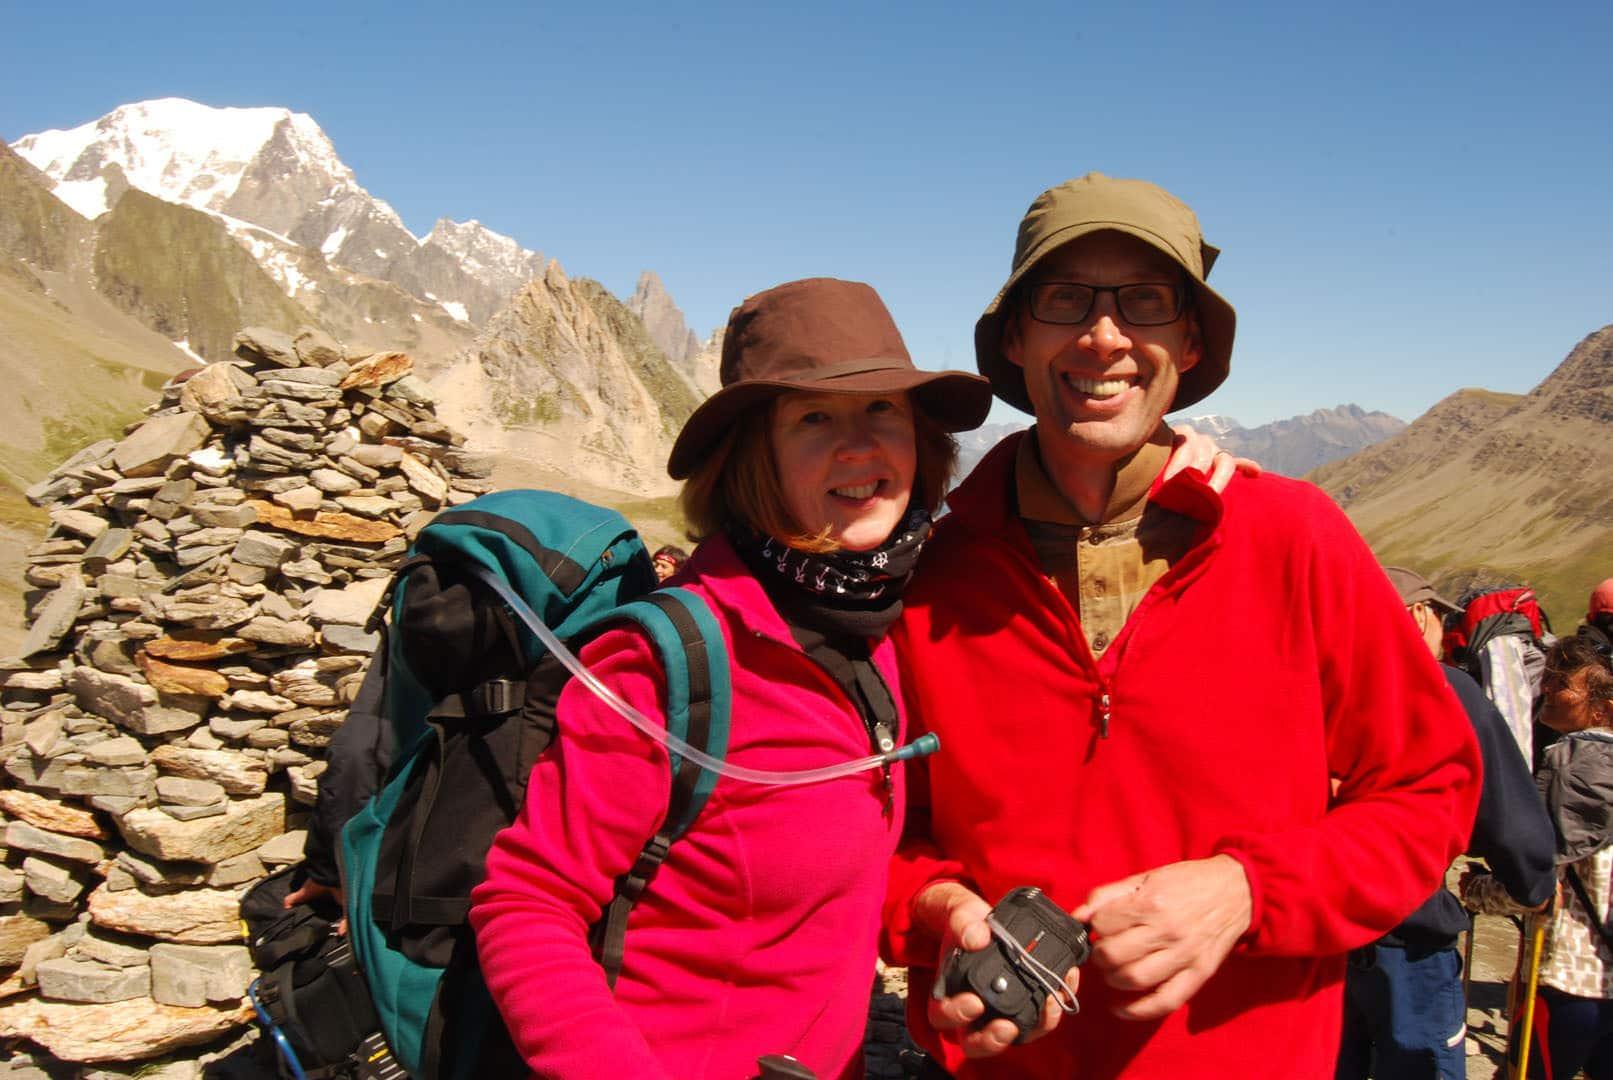 Trekkers TMB - Tour du Mont Blanc Gallery